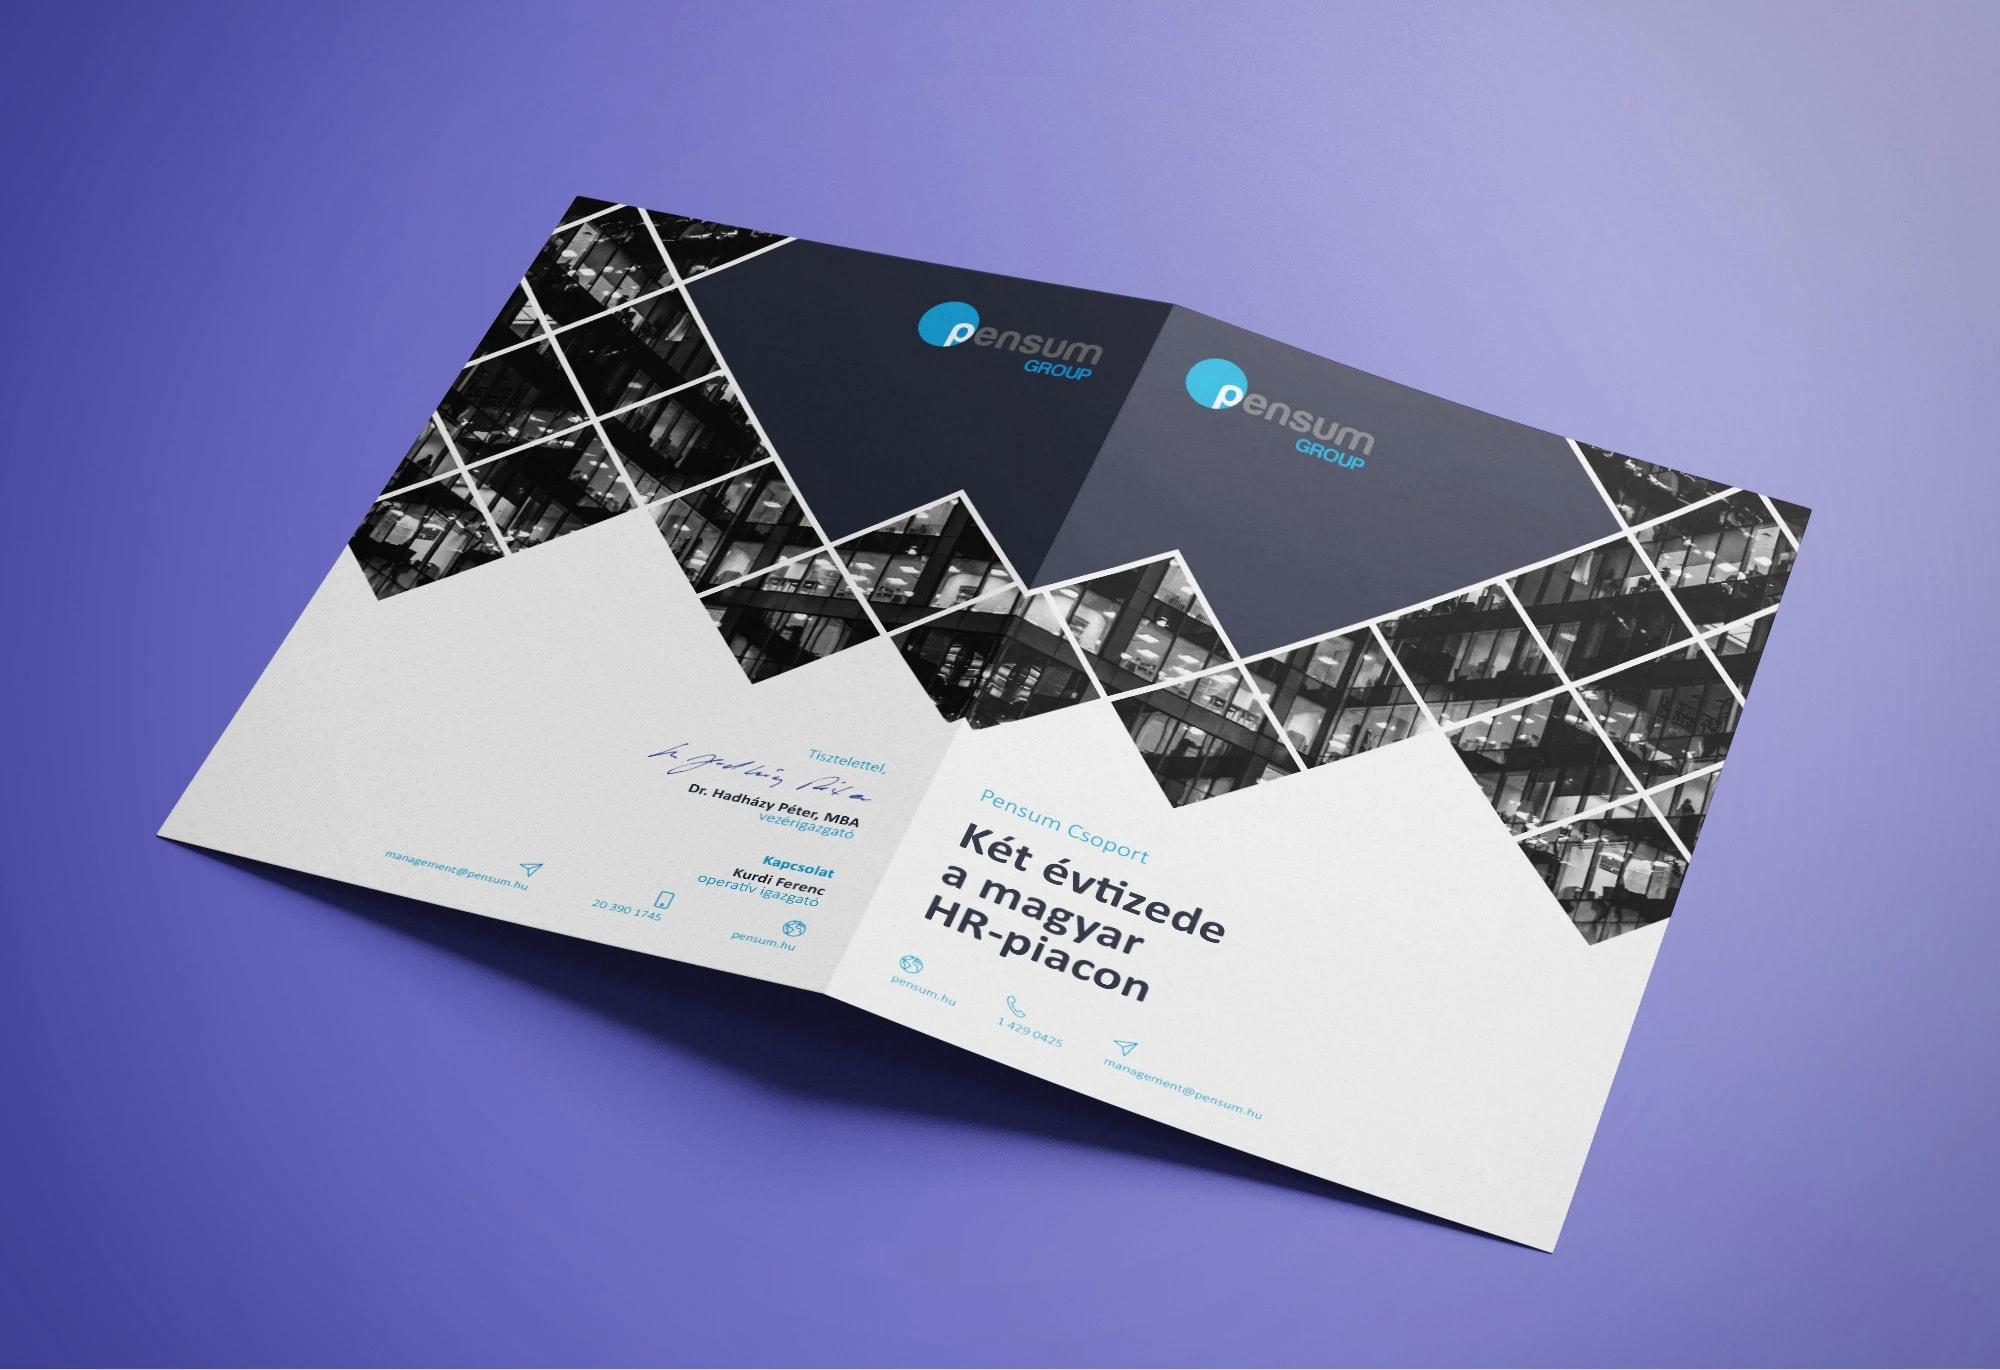 Pensum Group print dizájn